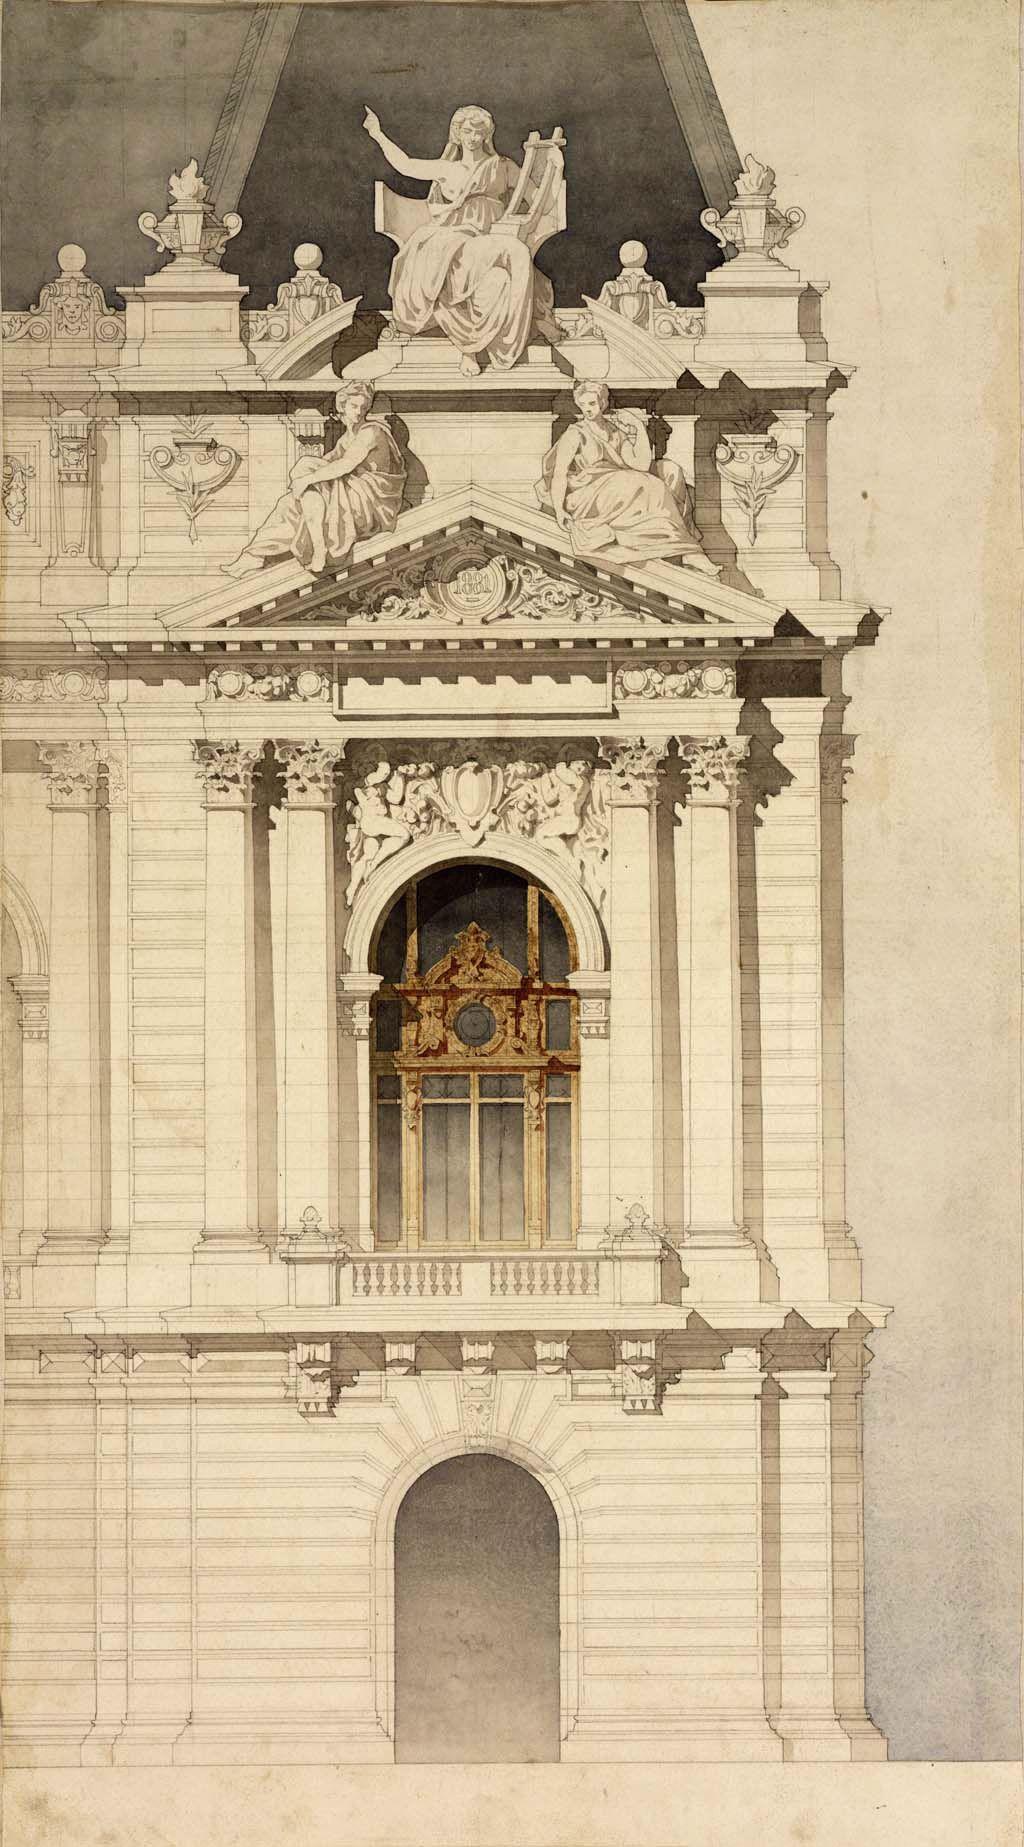 argentoalmoure deglane henri adolphe auguste palais. Black Bedroom Furniture Sets. Home Design Ideas